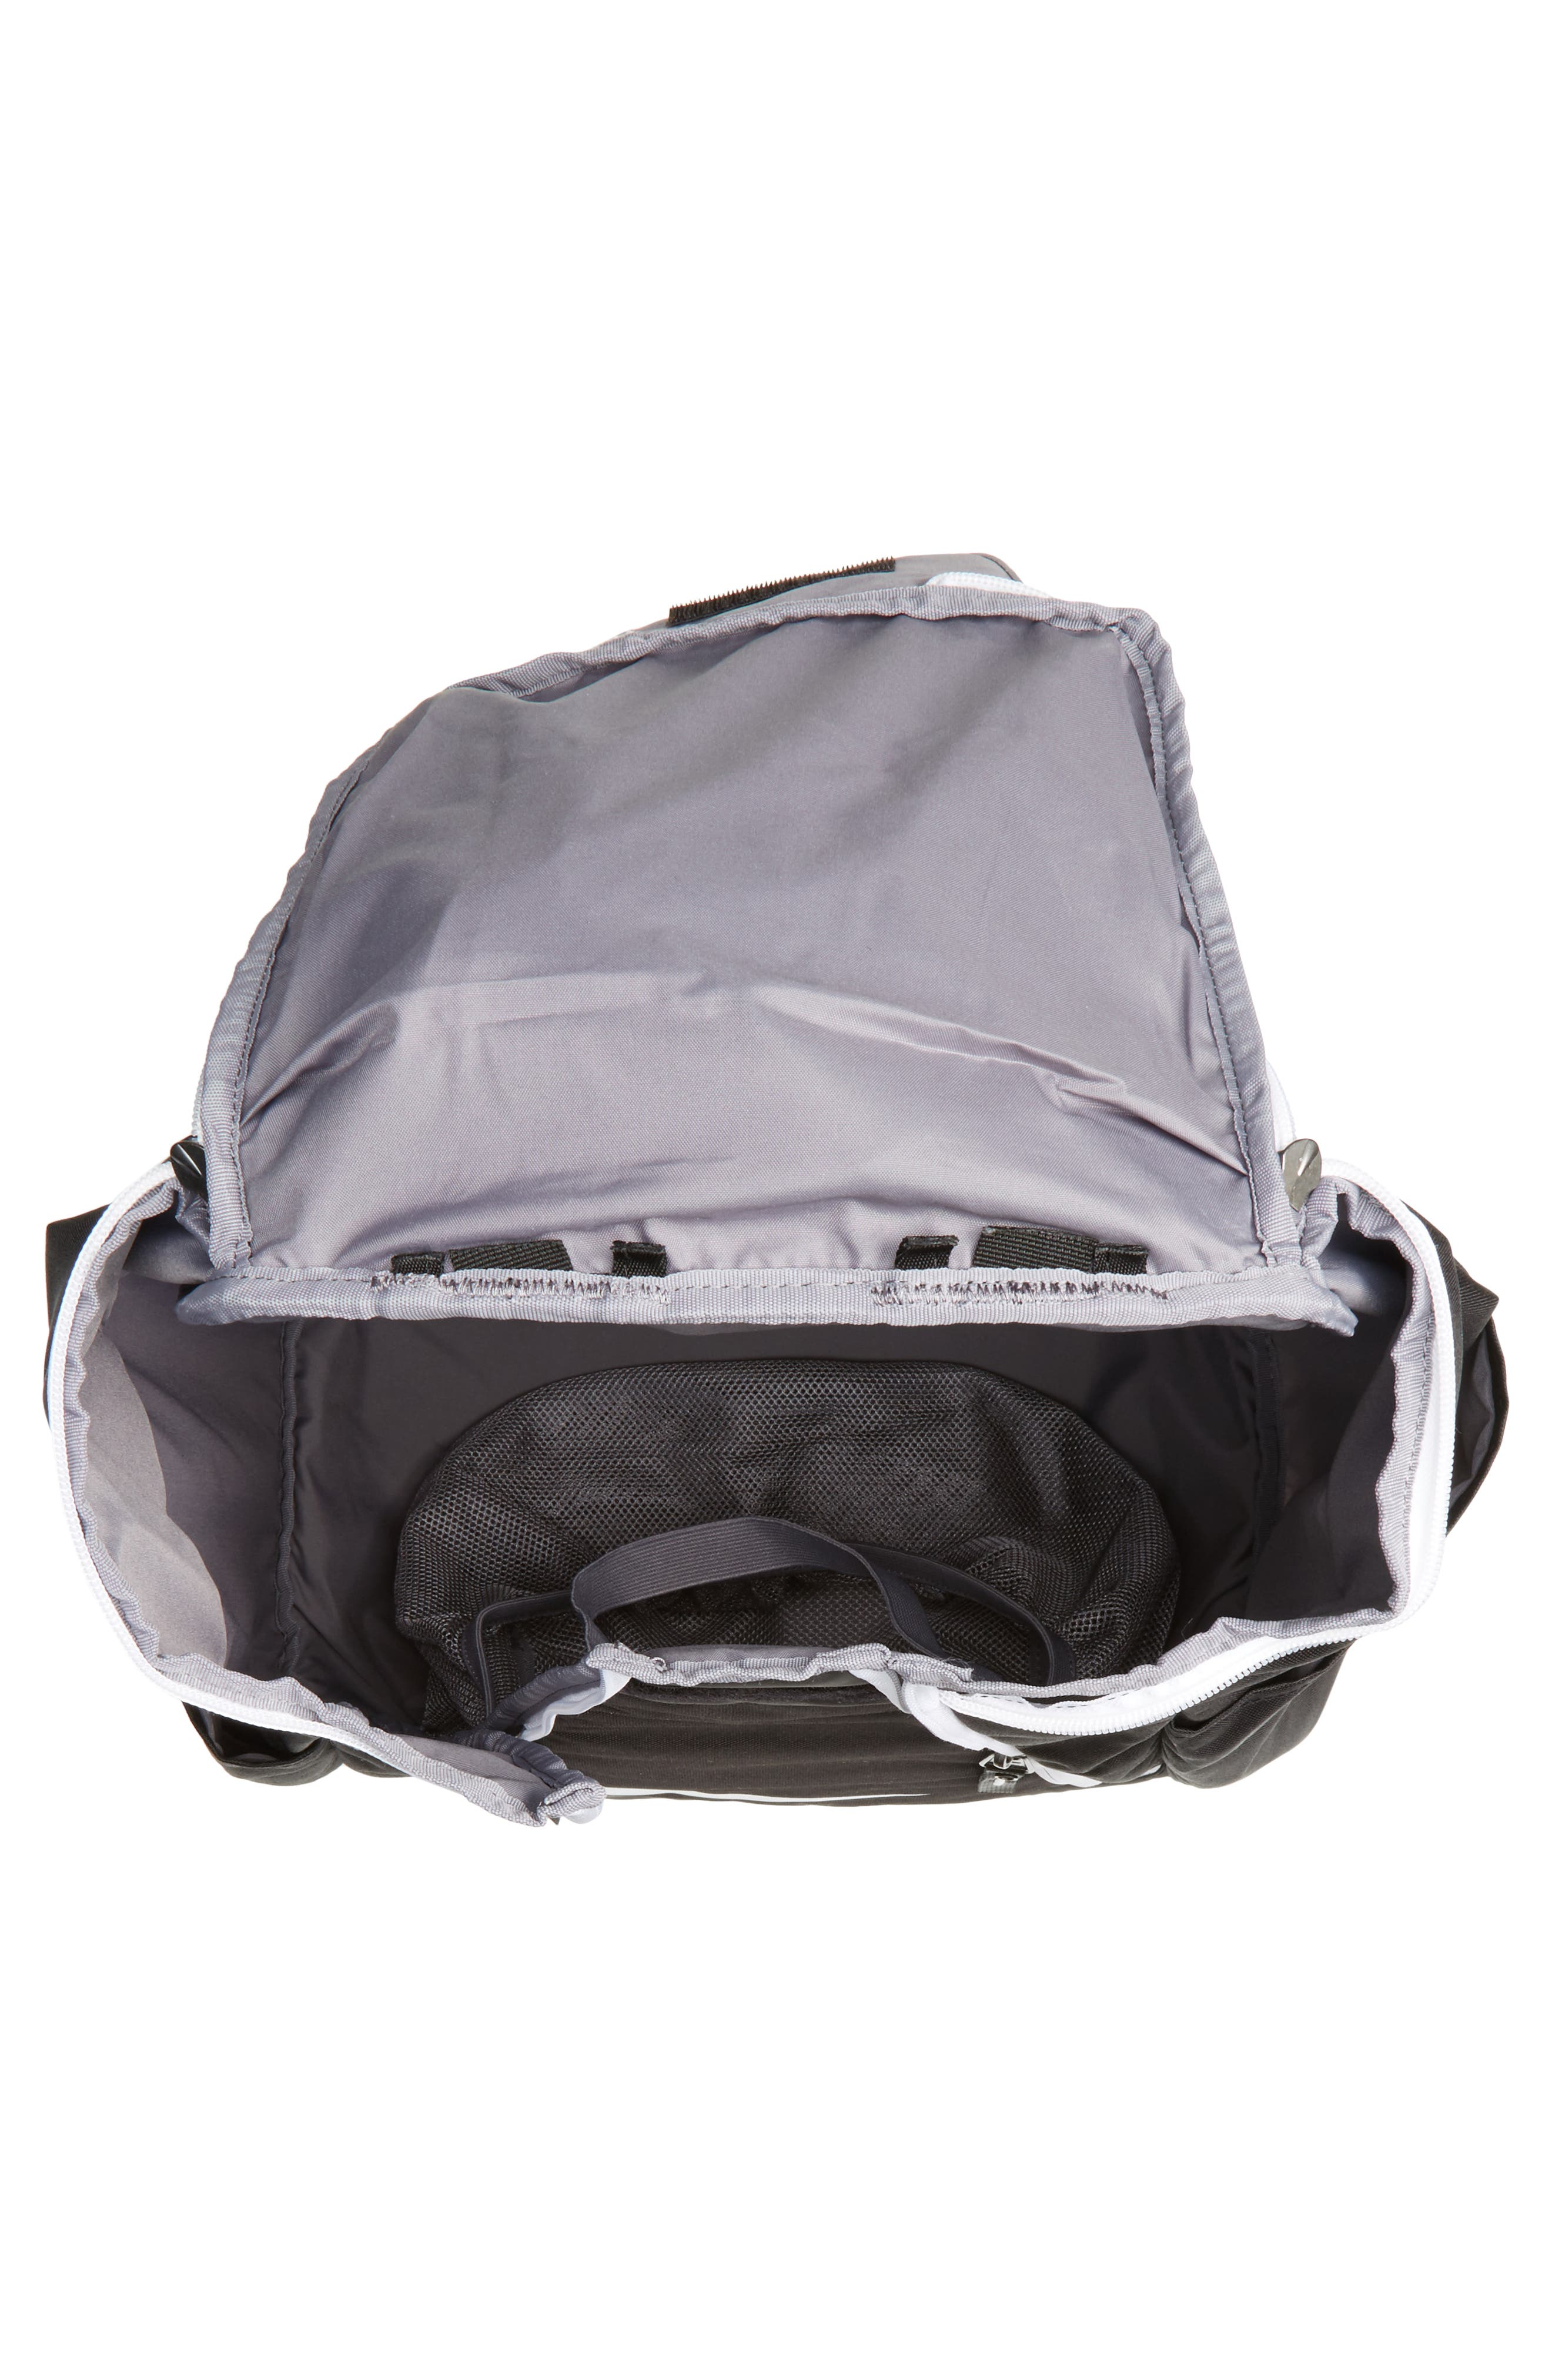 Hoops Elite Max Air Team Backpack,                             Alternate thumbnail 3, color,                             Black / White